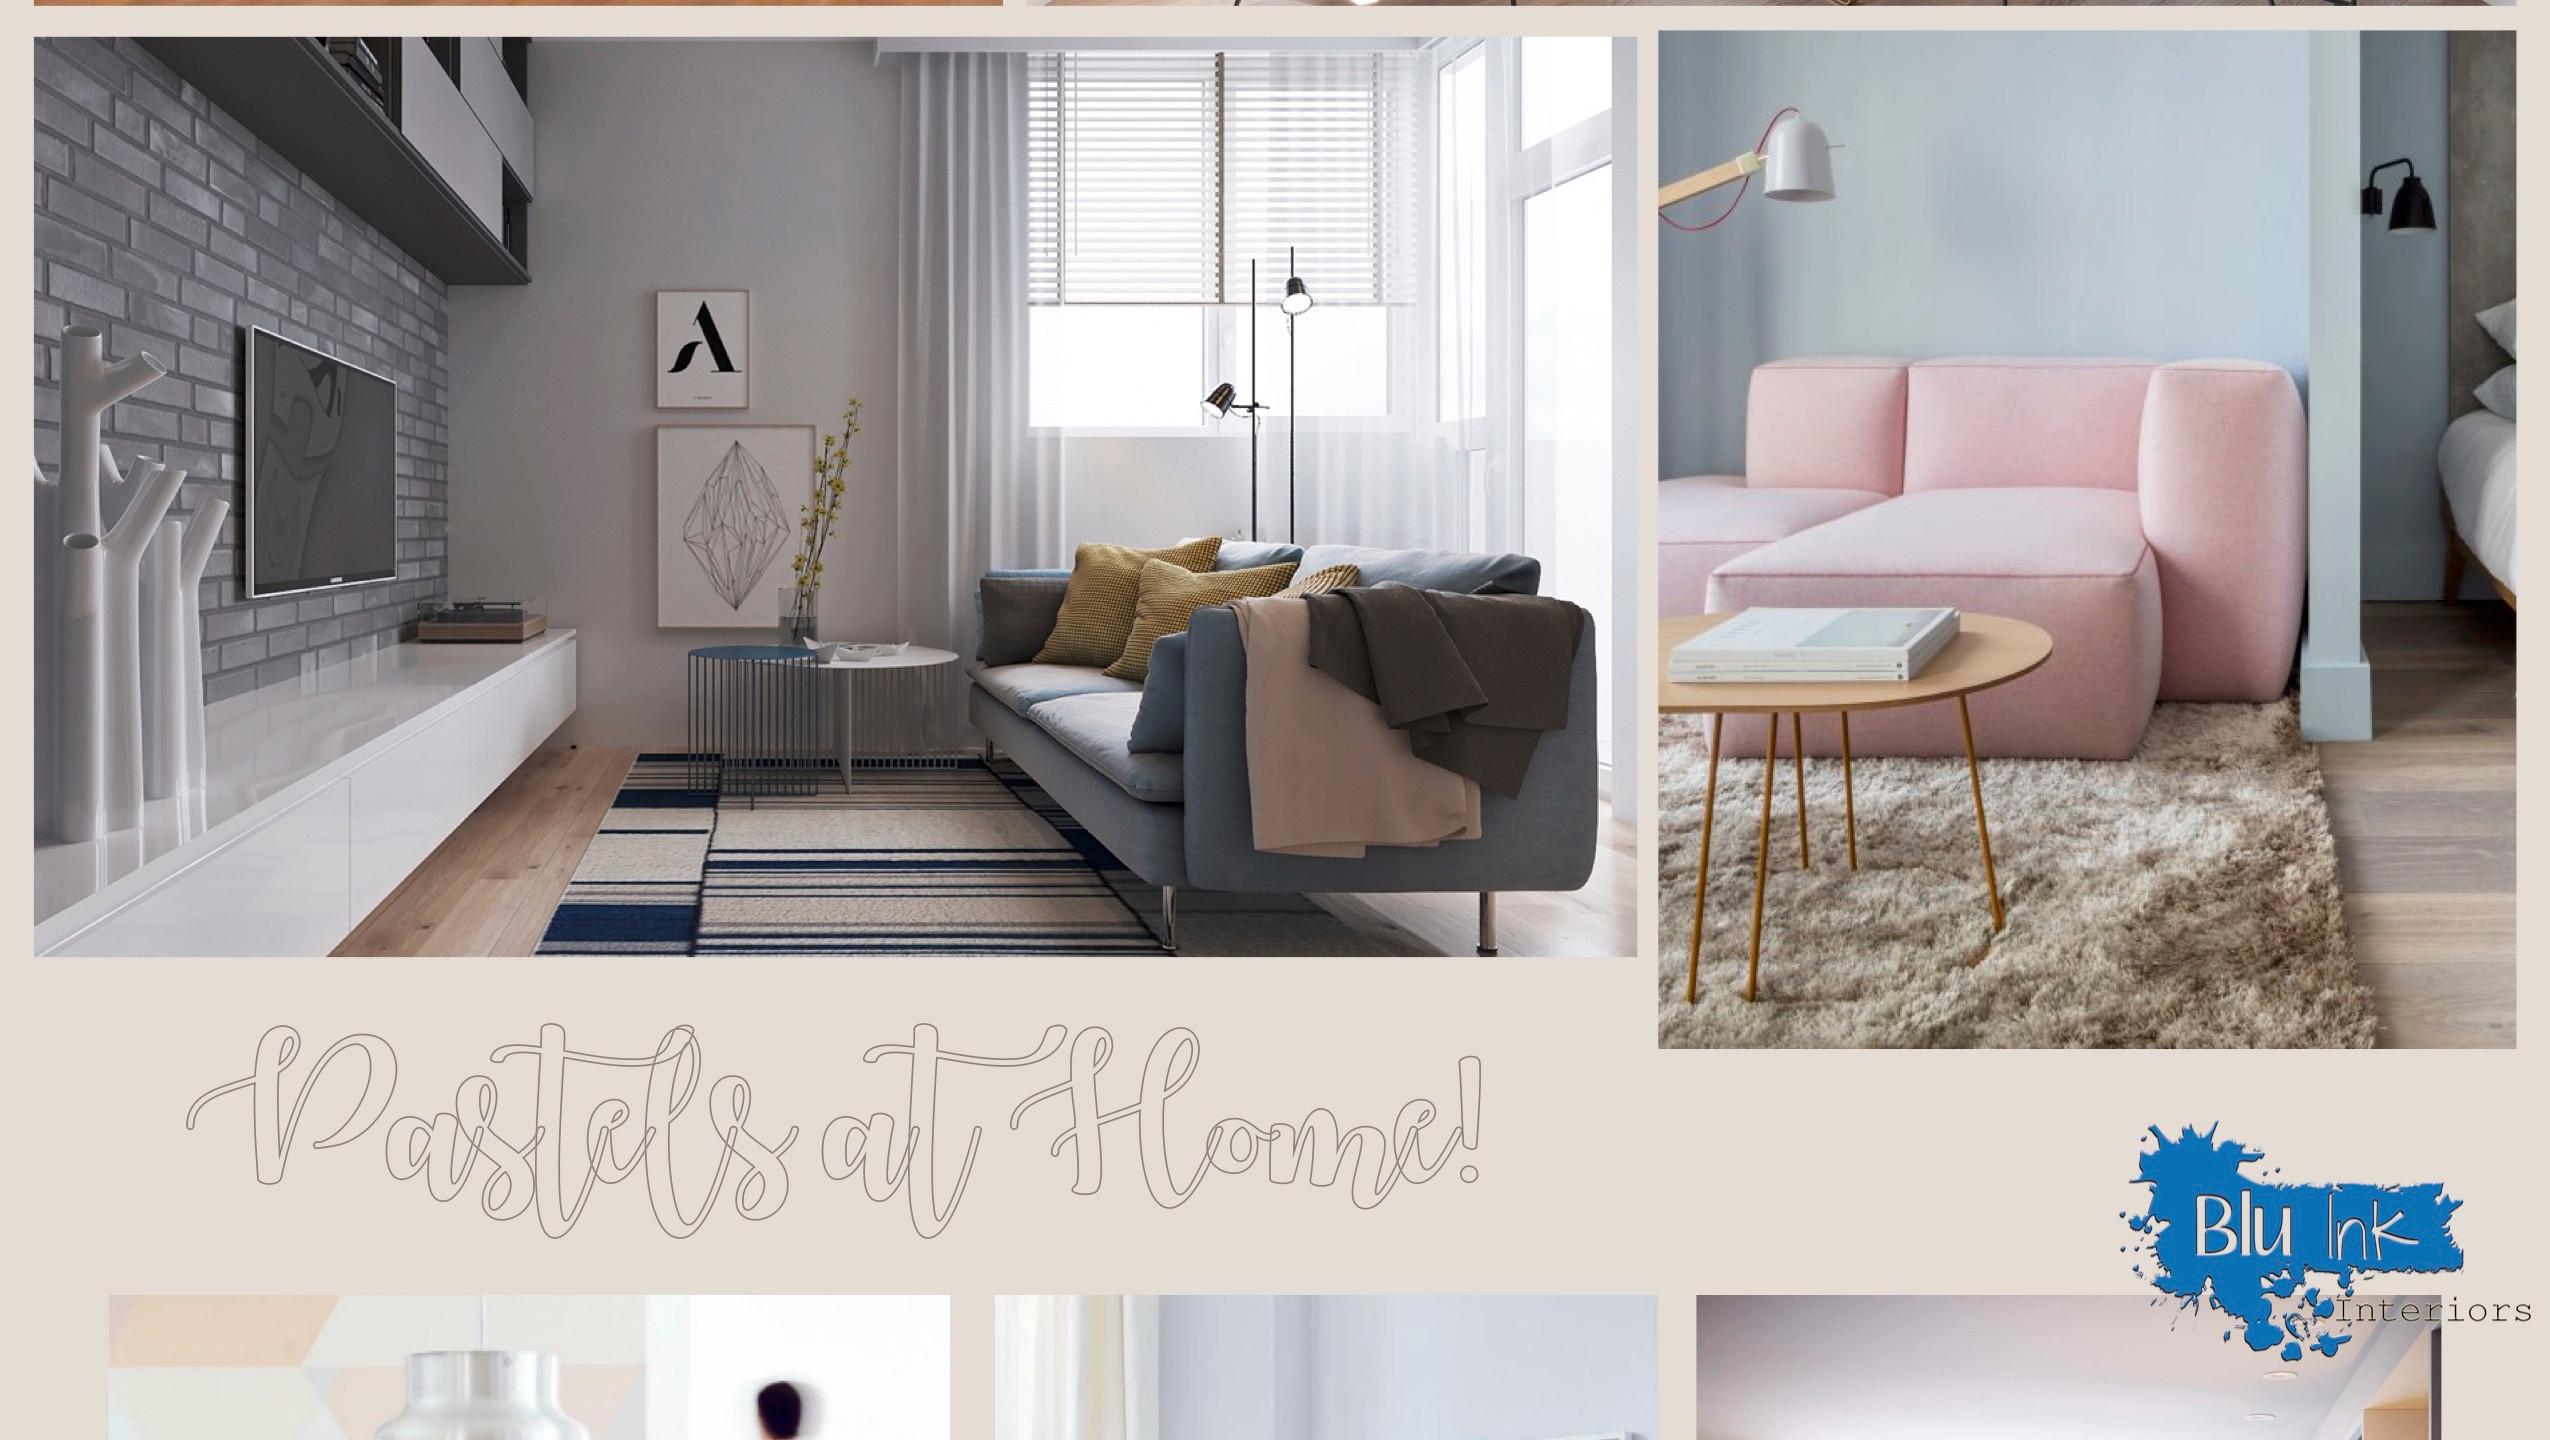 Blu Ink Interiors Pastels at Home